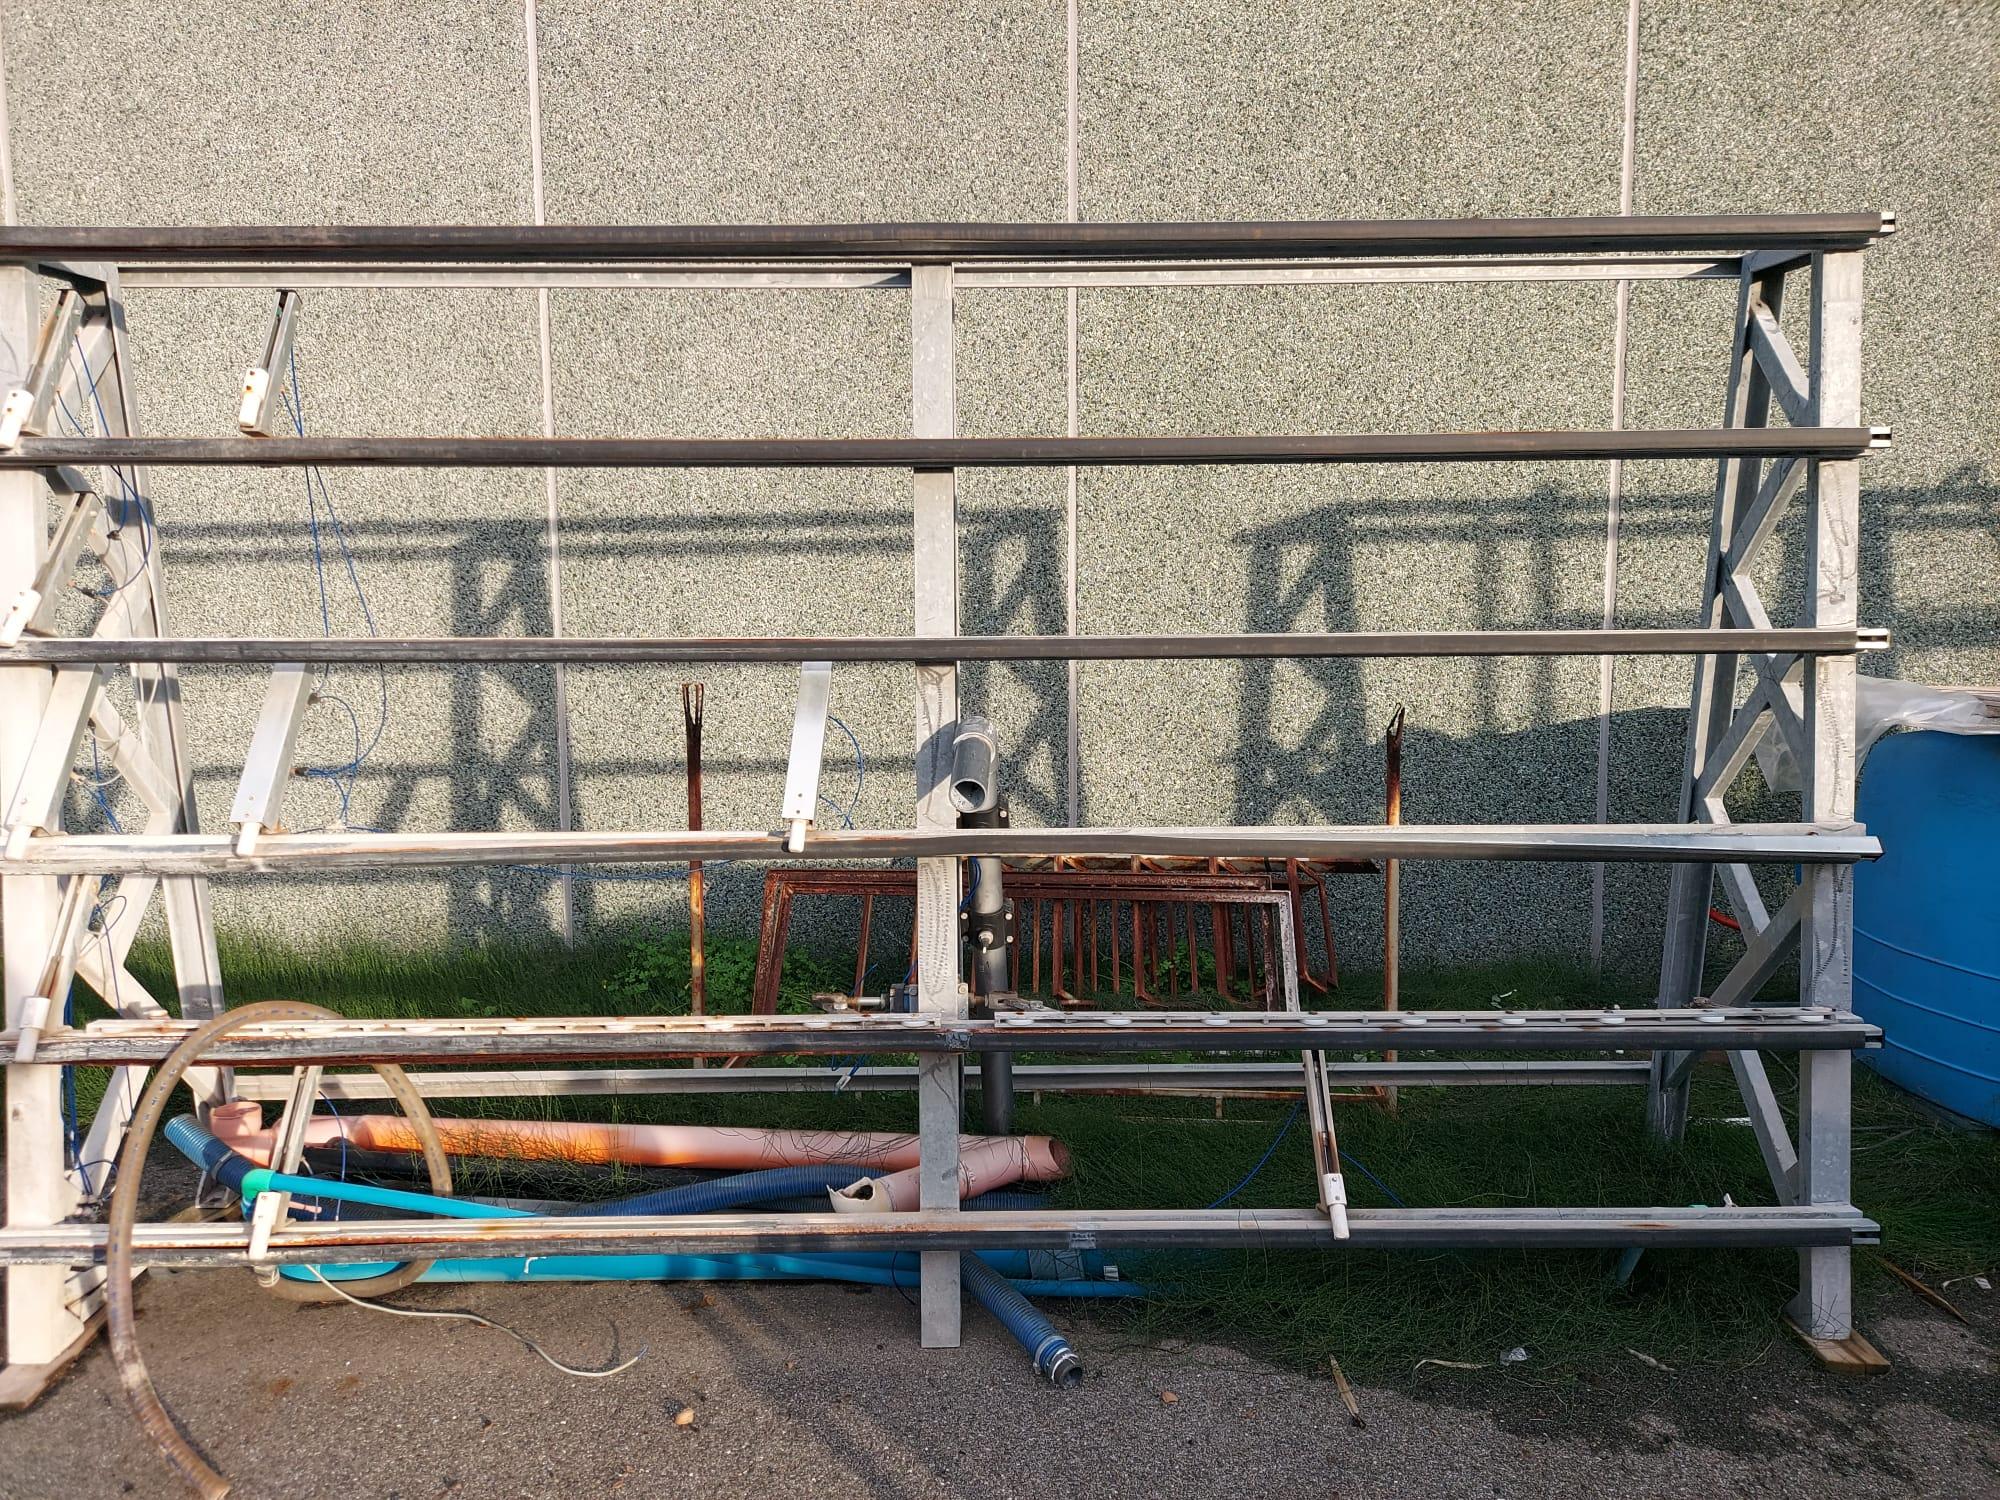 macchina taglio vetro blindato in vendita - foto 7